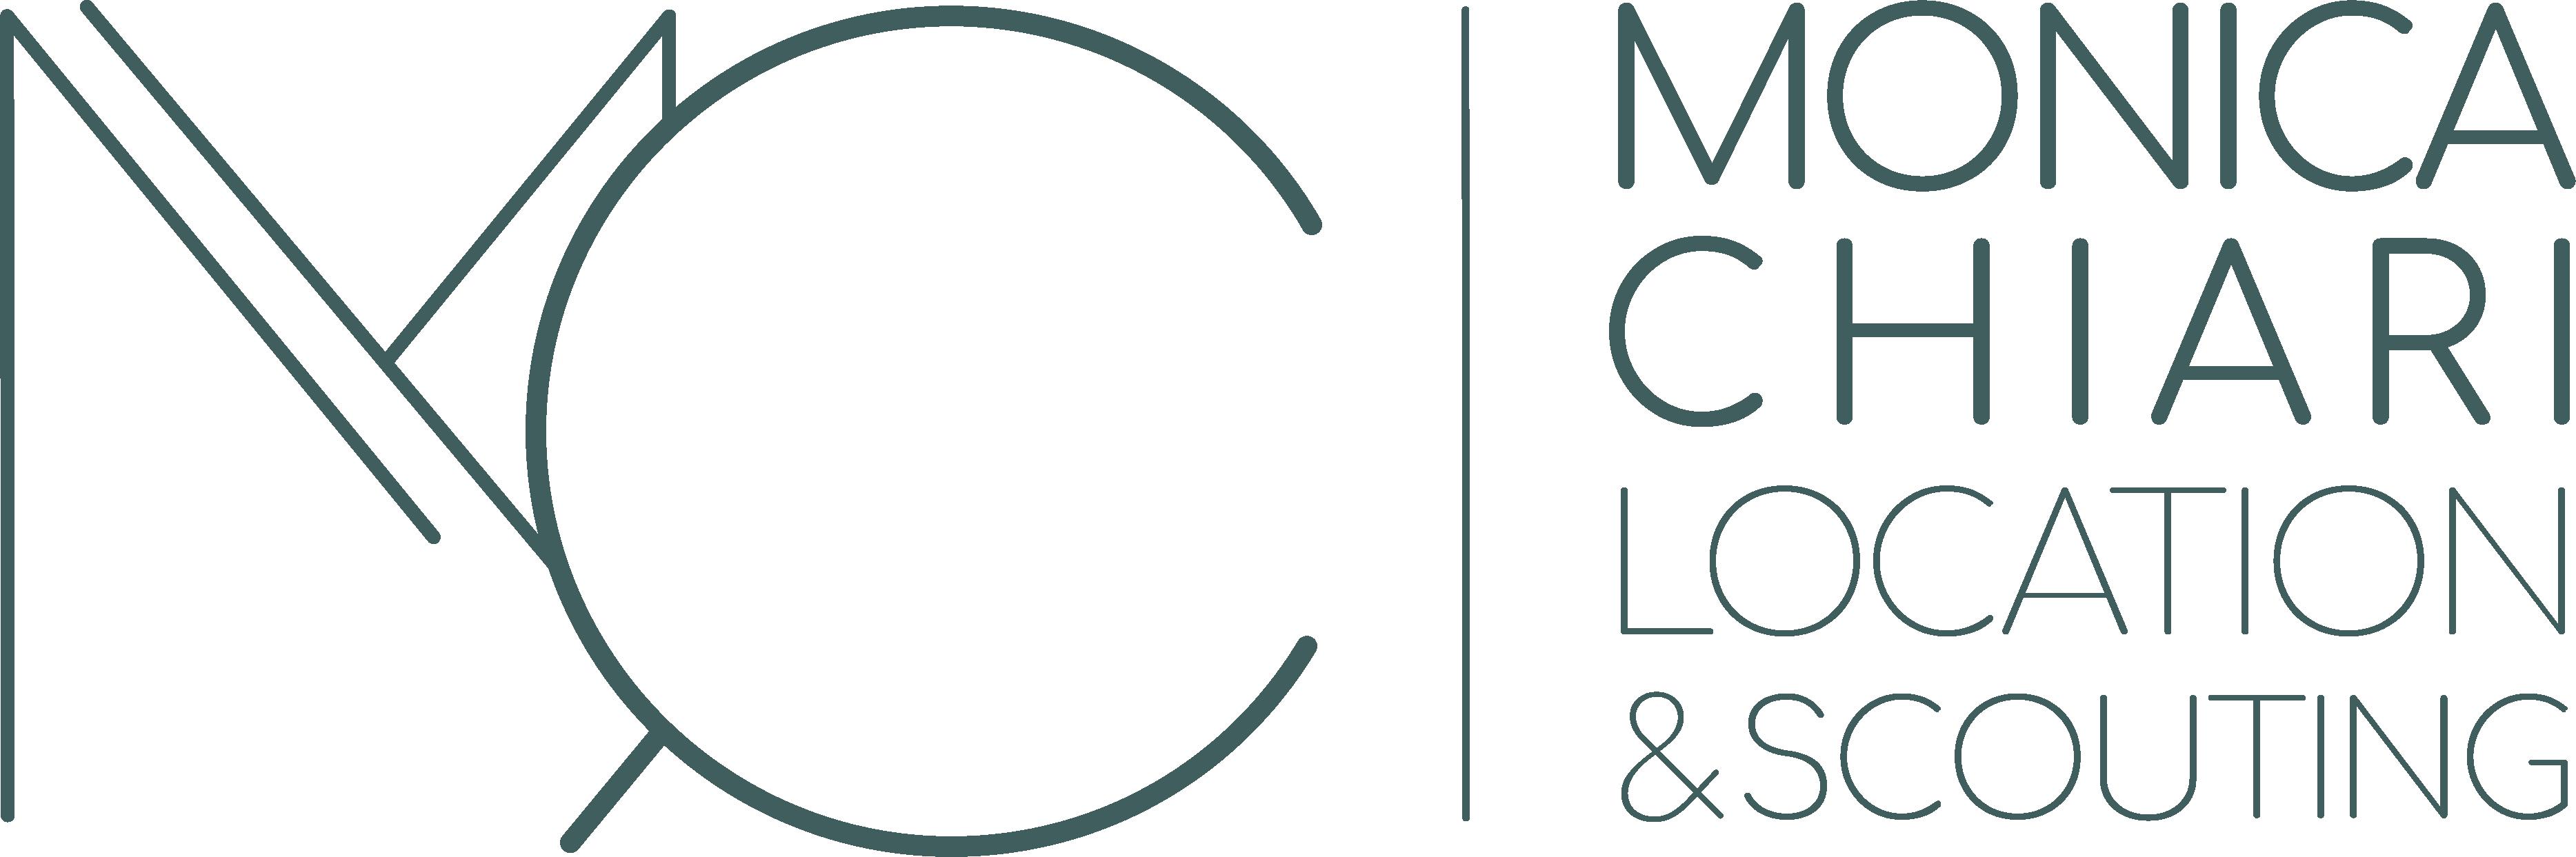 Monica Chiari – Location Manager